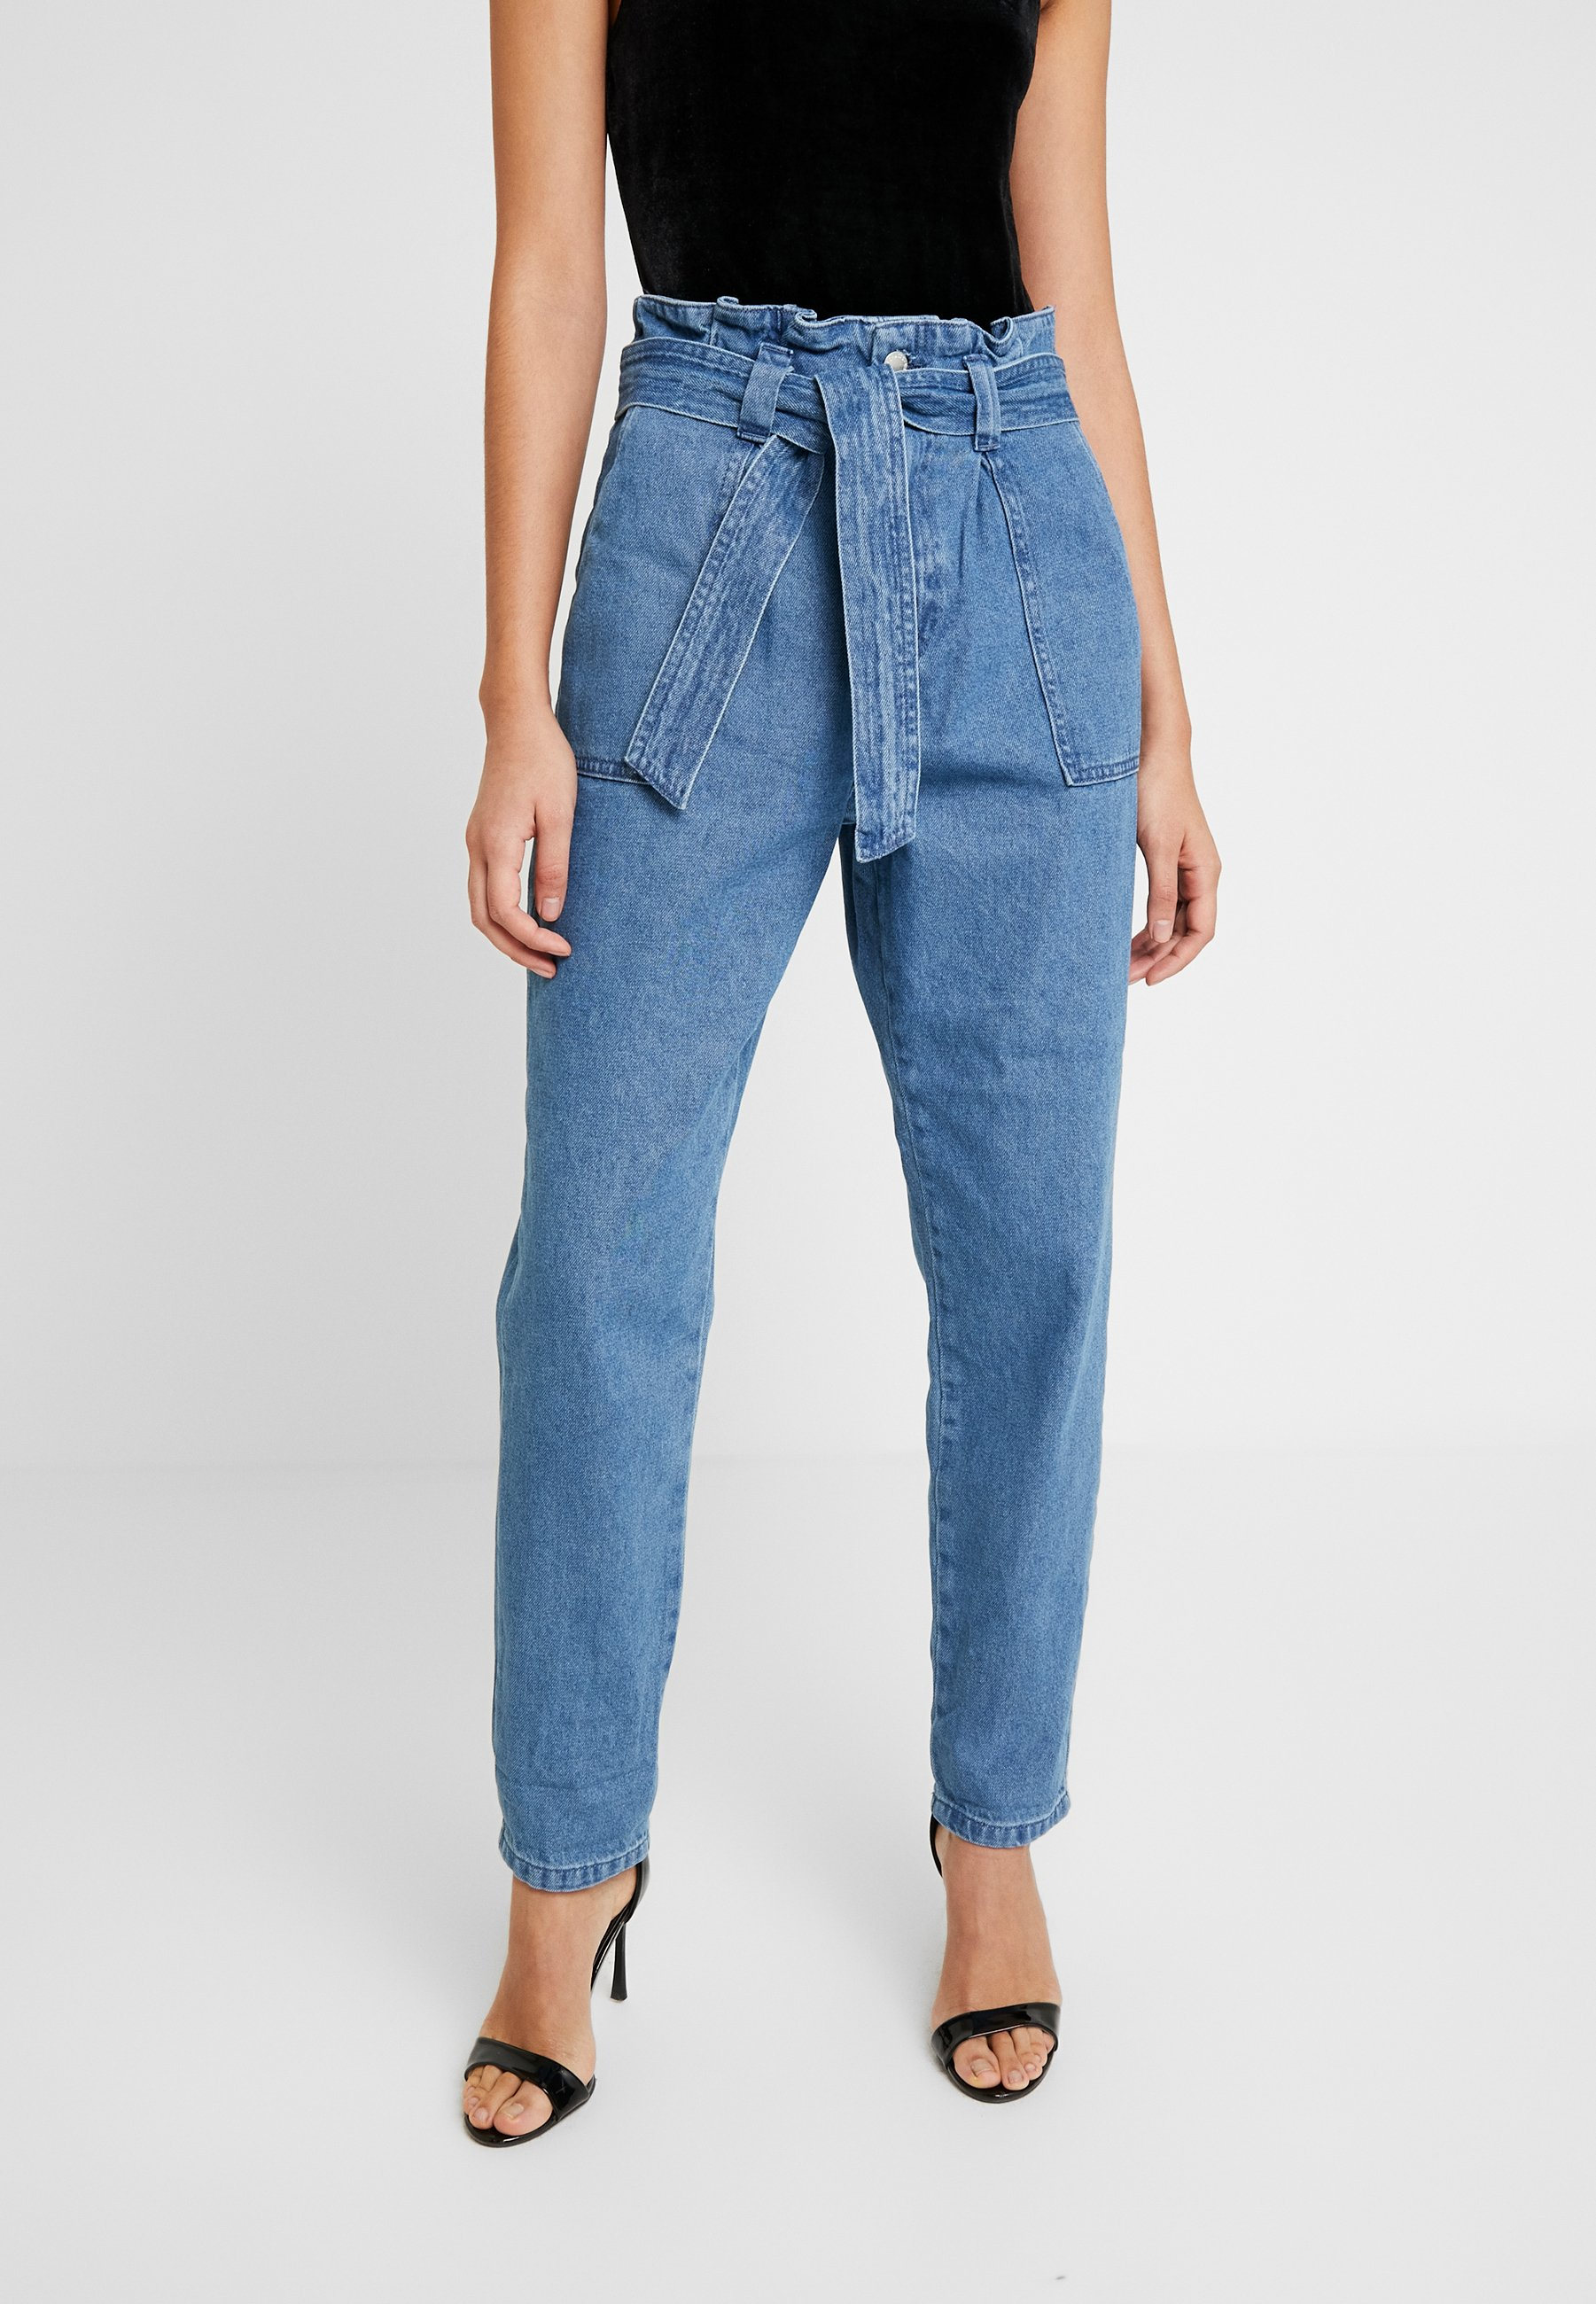 Miss Selfridge PAPERBAG - Jeans baggy blue